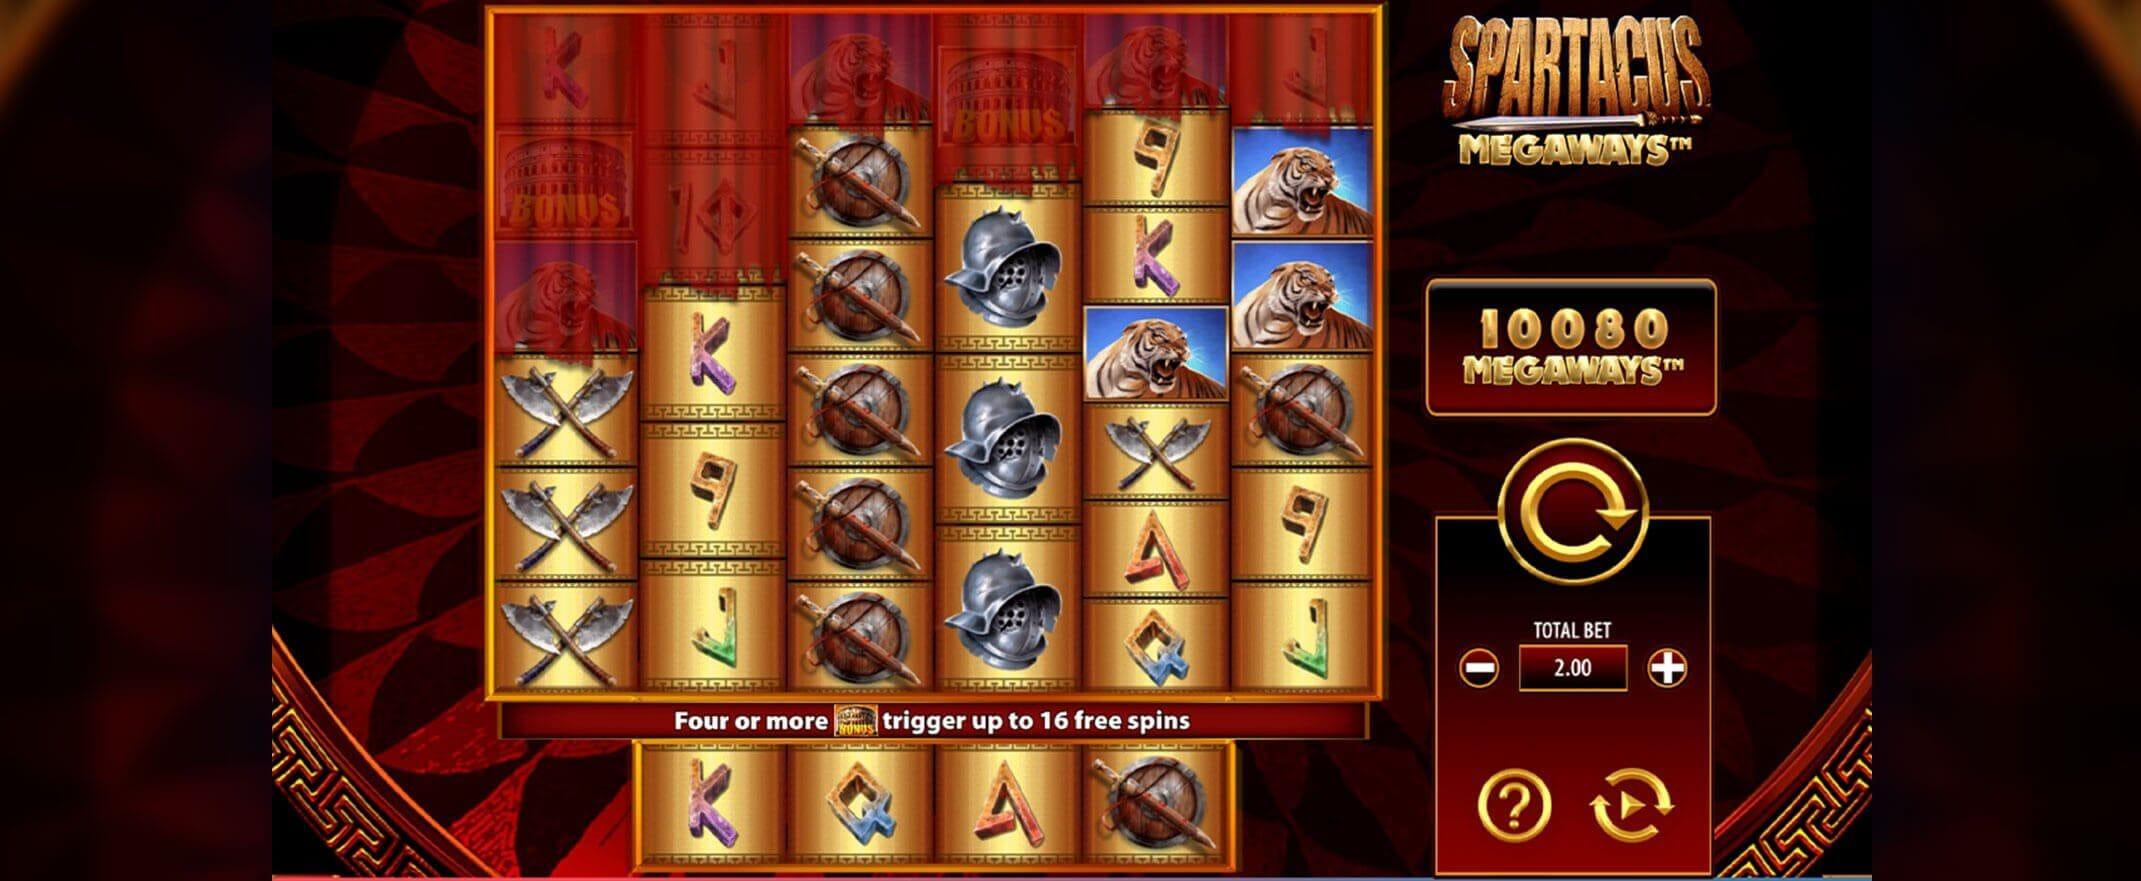 Spartacus Megaways Slot Bonus